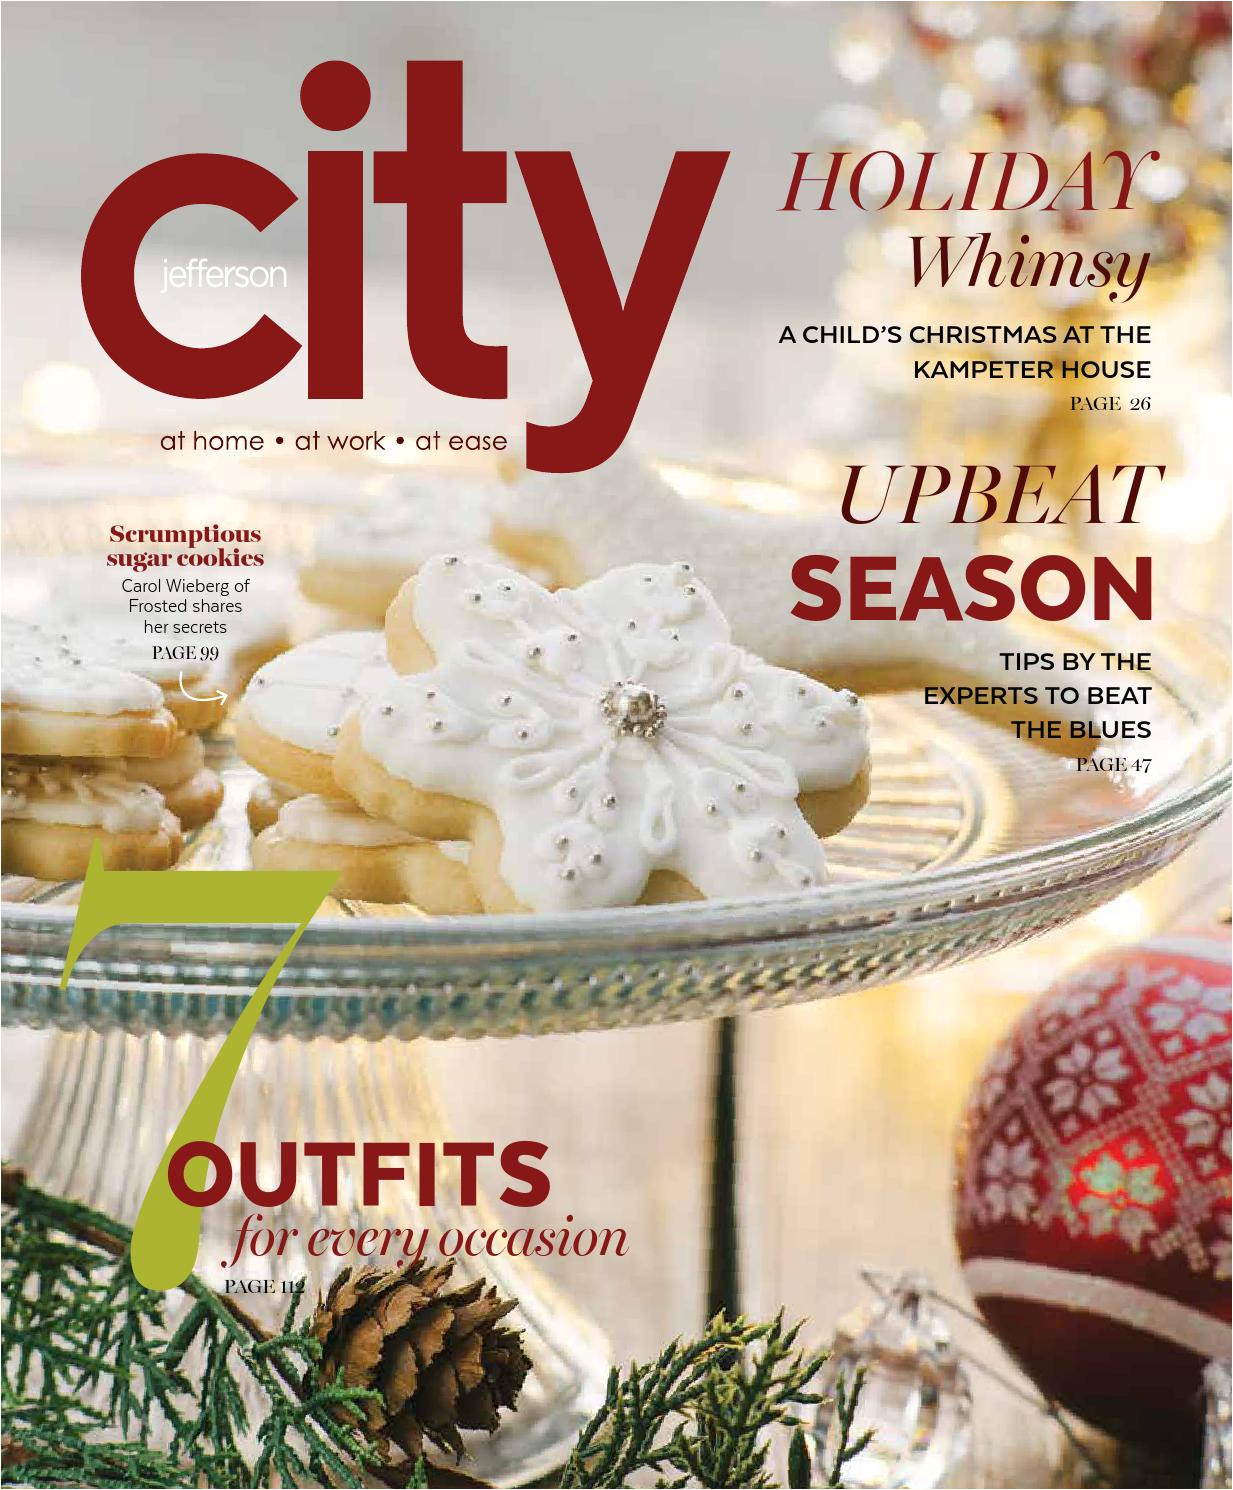 jefferson city magazine november december 2015 by business times company issuu